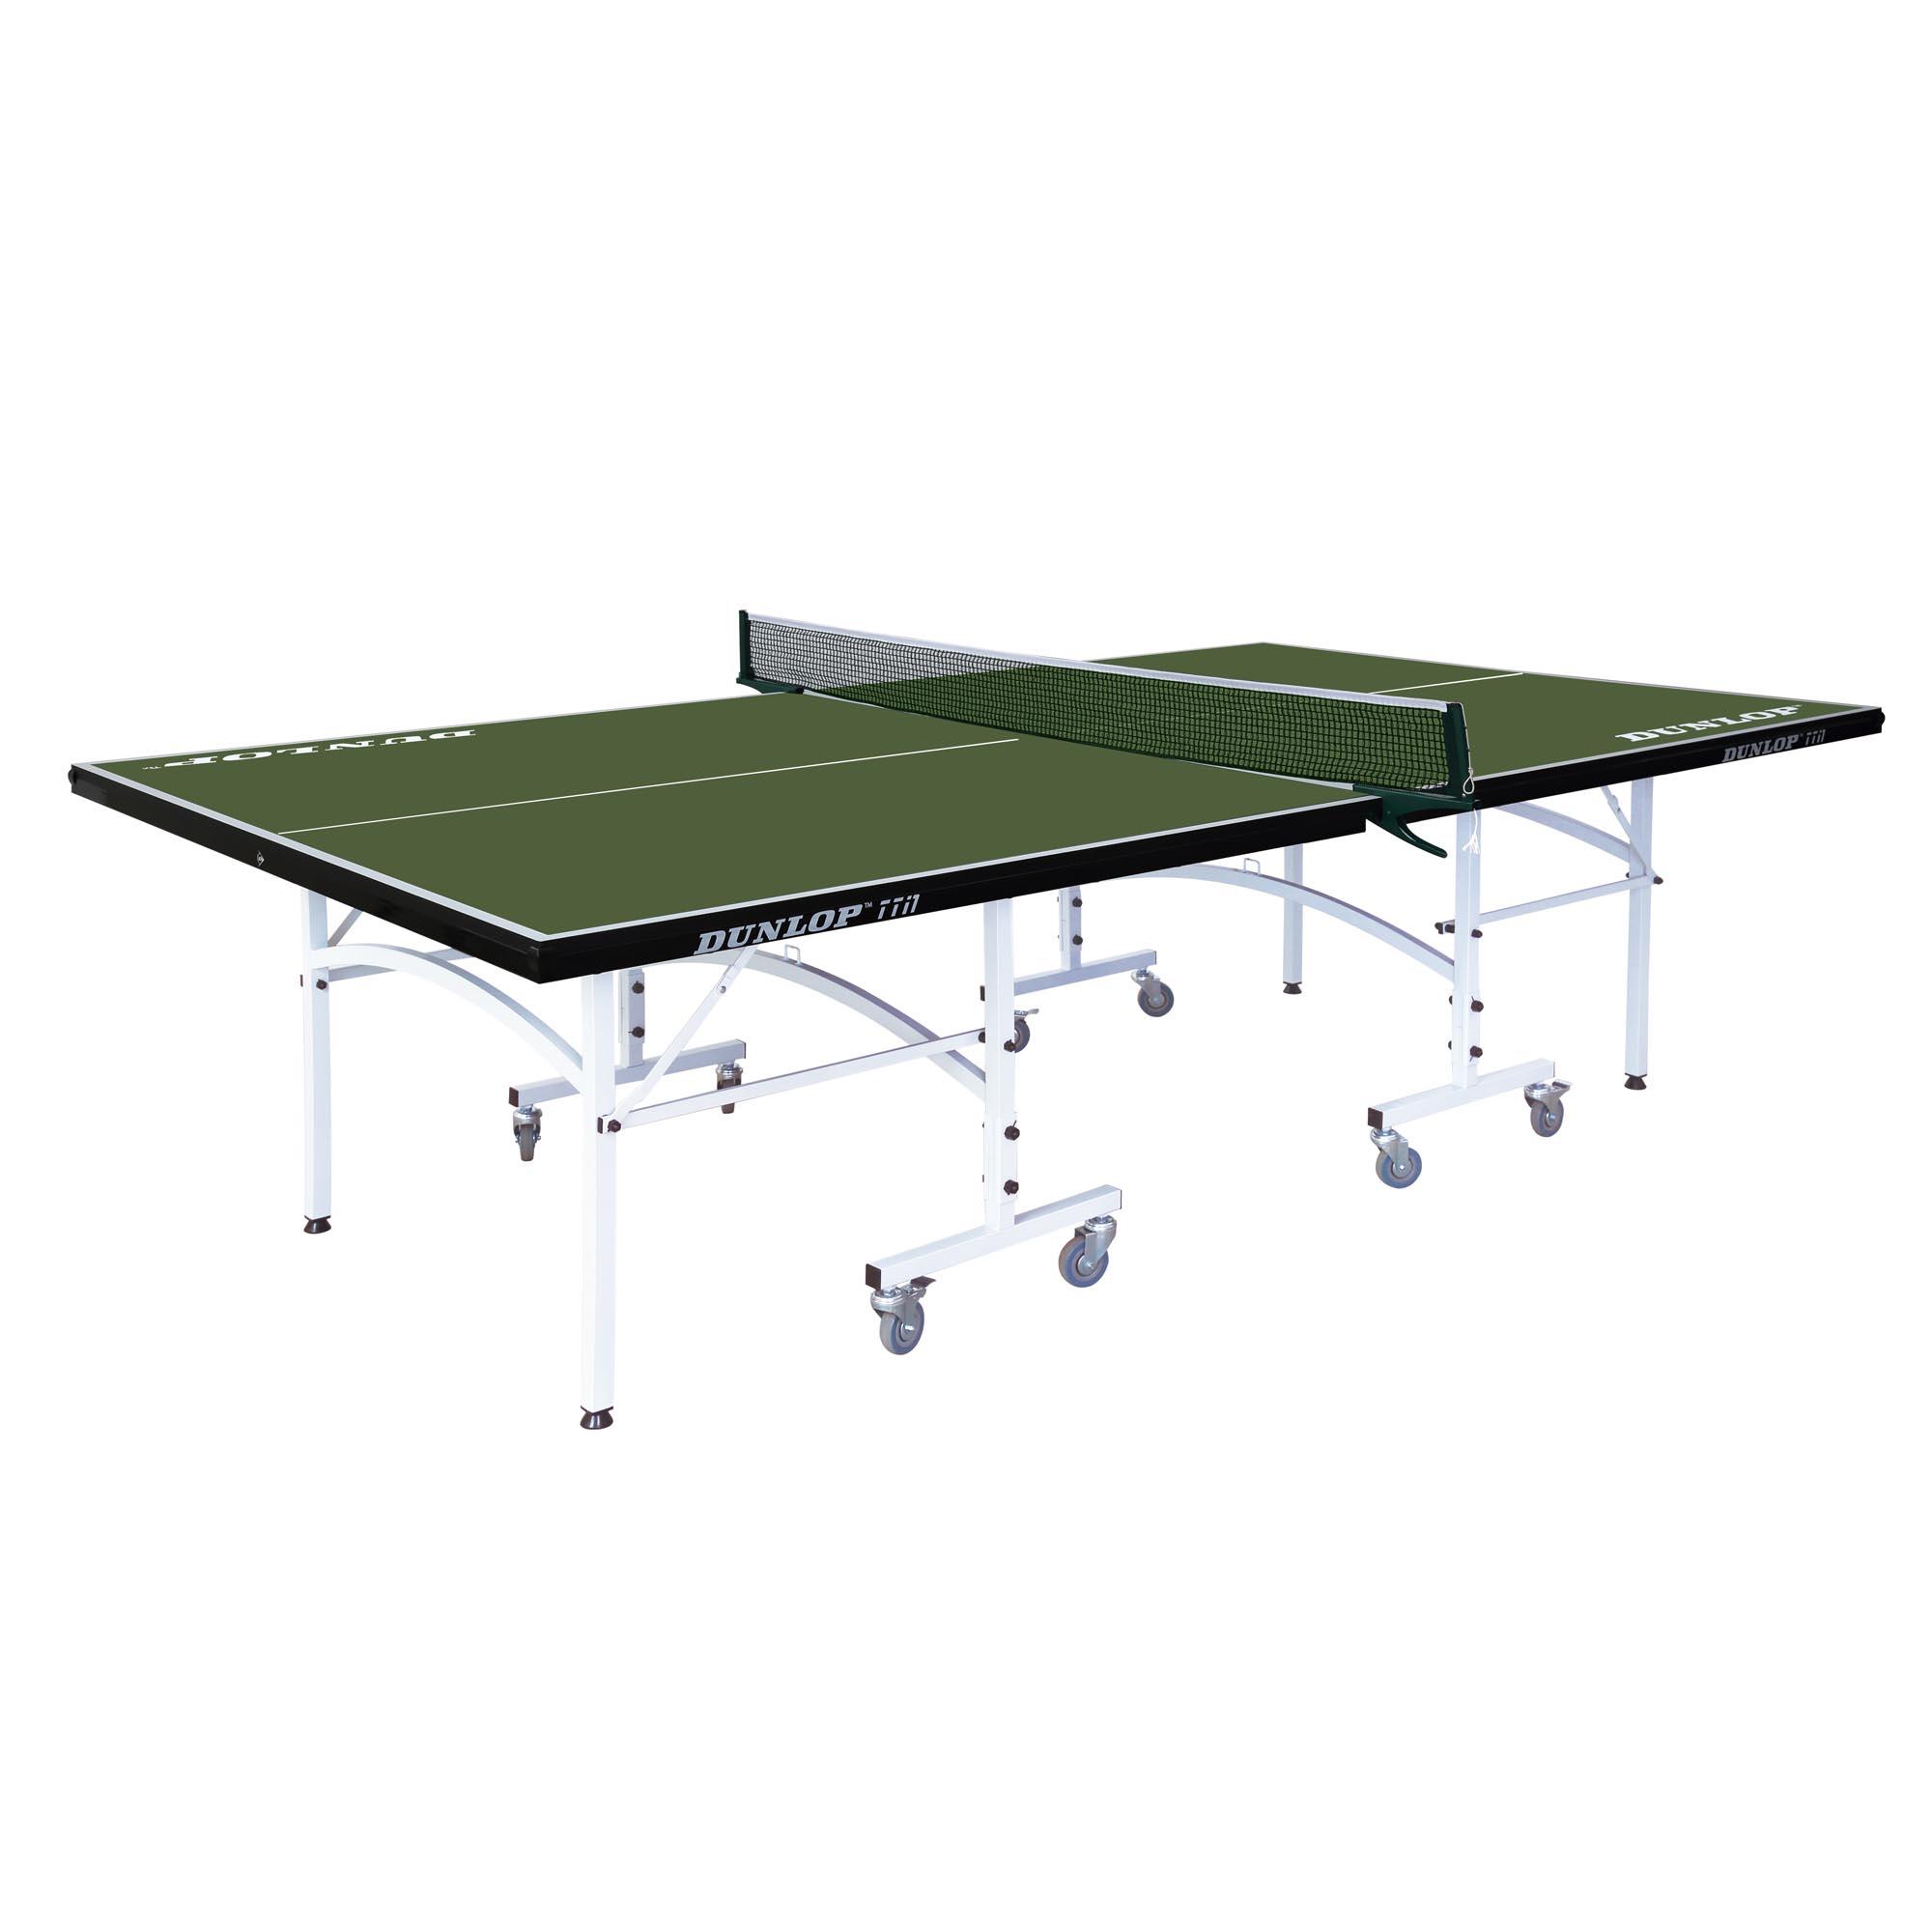 Dunlop TTi1 Indoor Table Tennis Table  Green